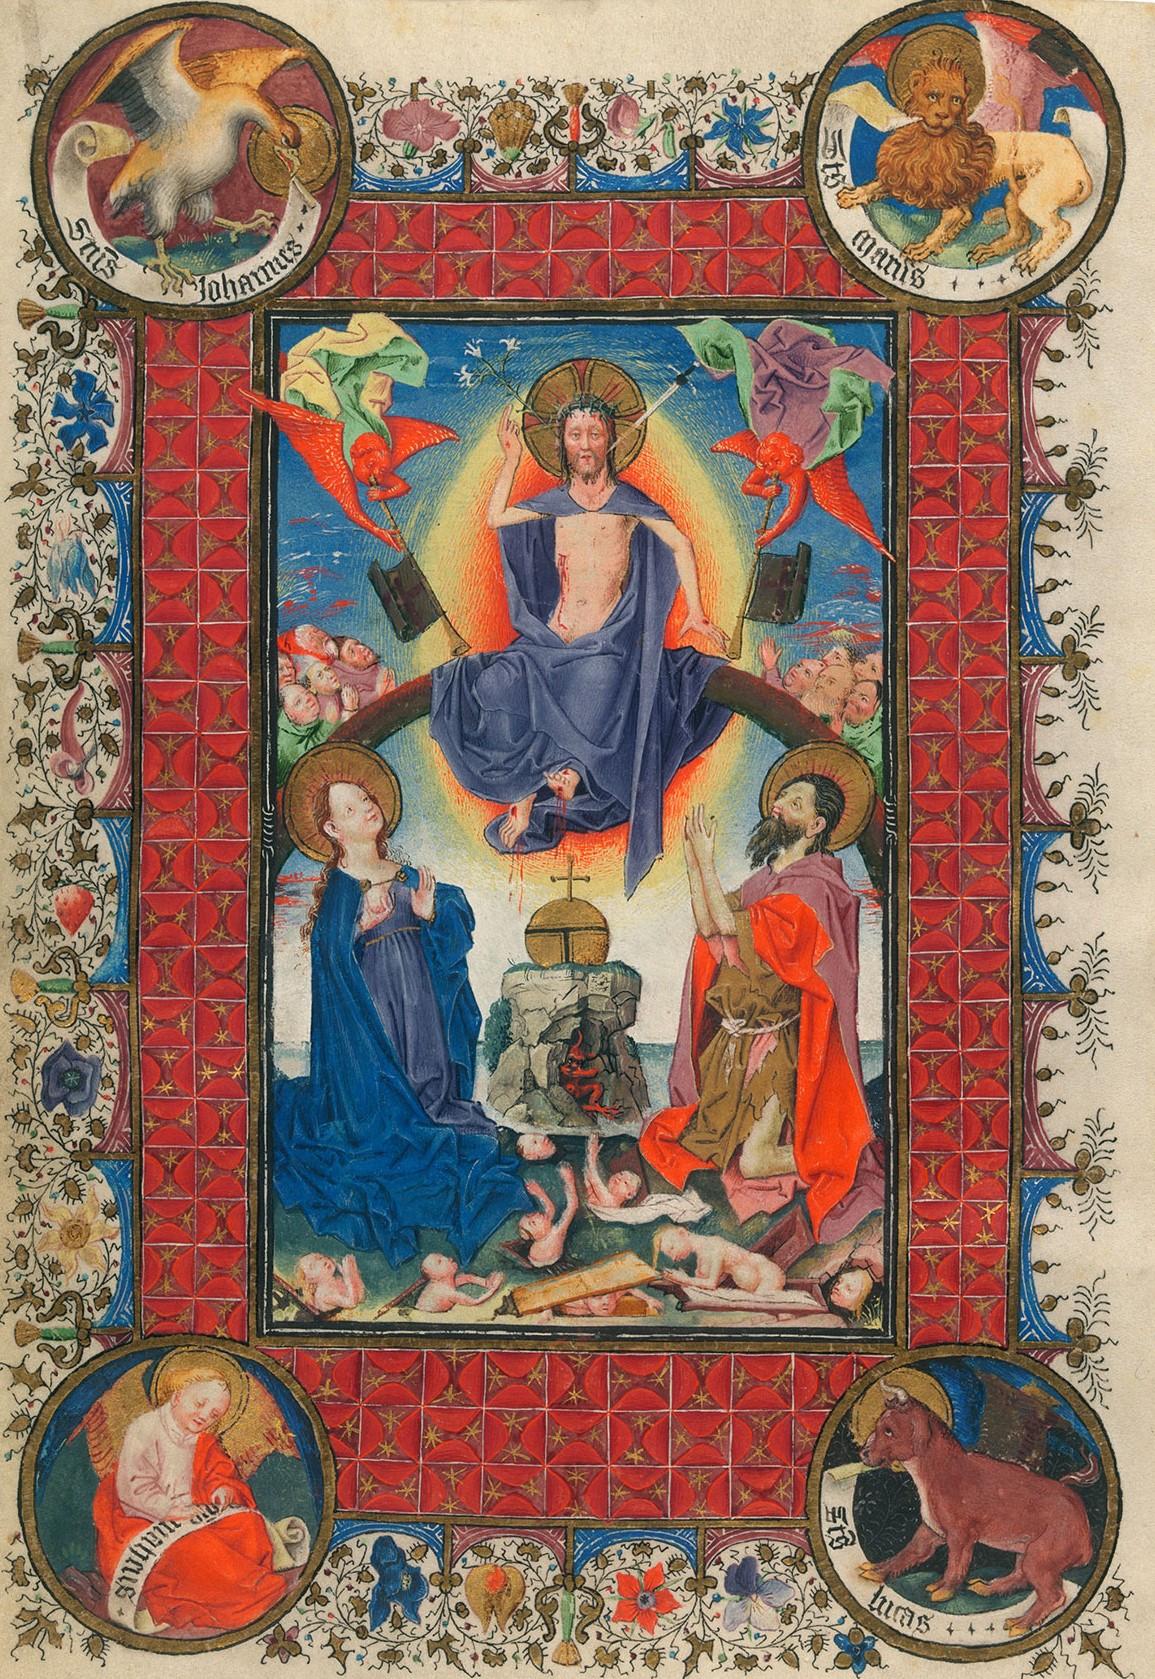 Heures de Catherine de Cleves 1440 ca MSS M.917945, p. 28–f 151r Morgan Library